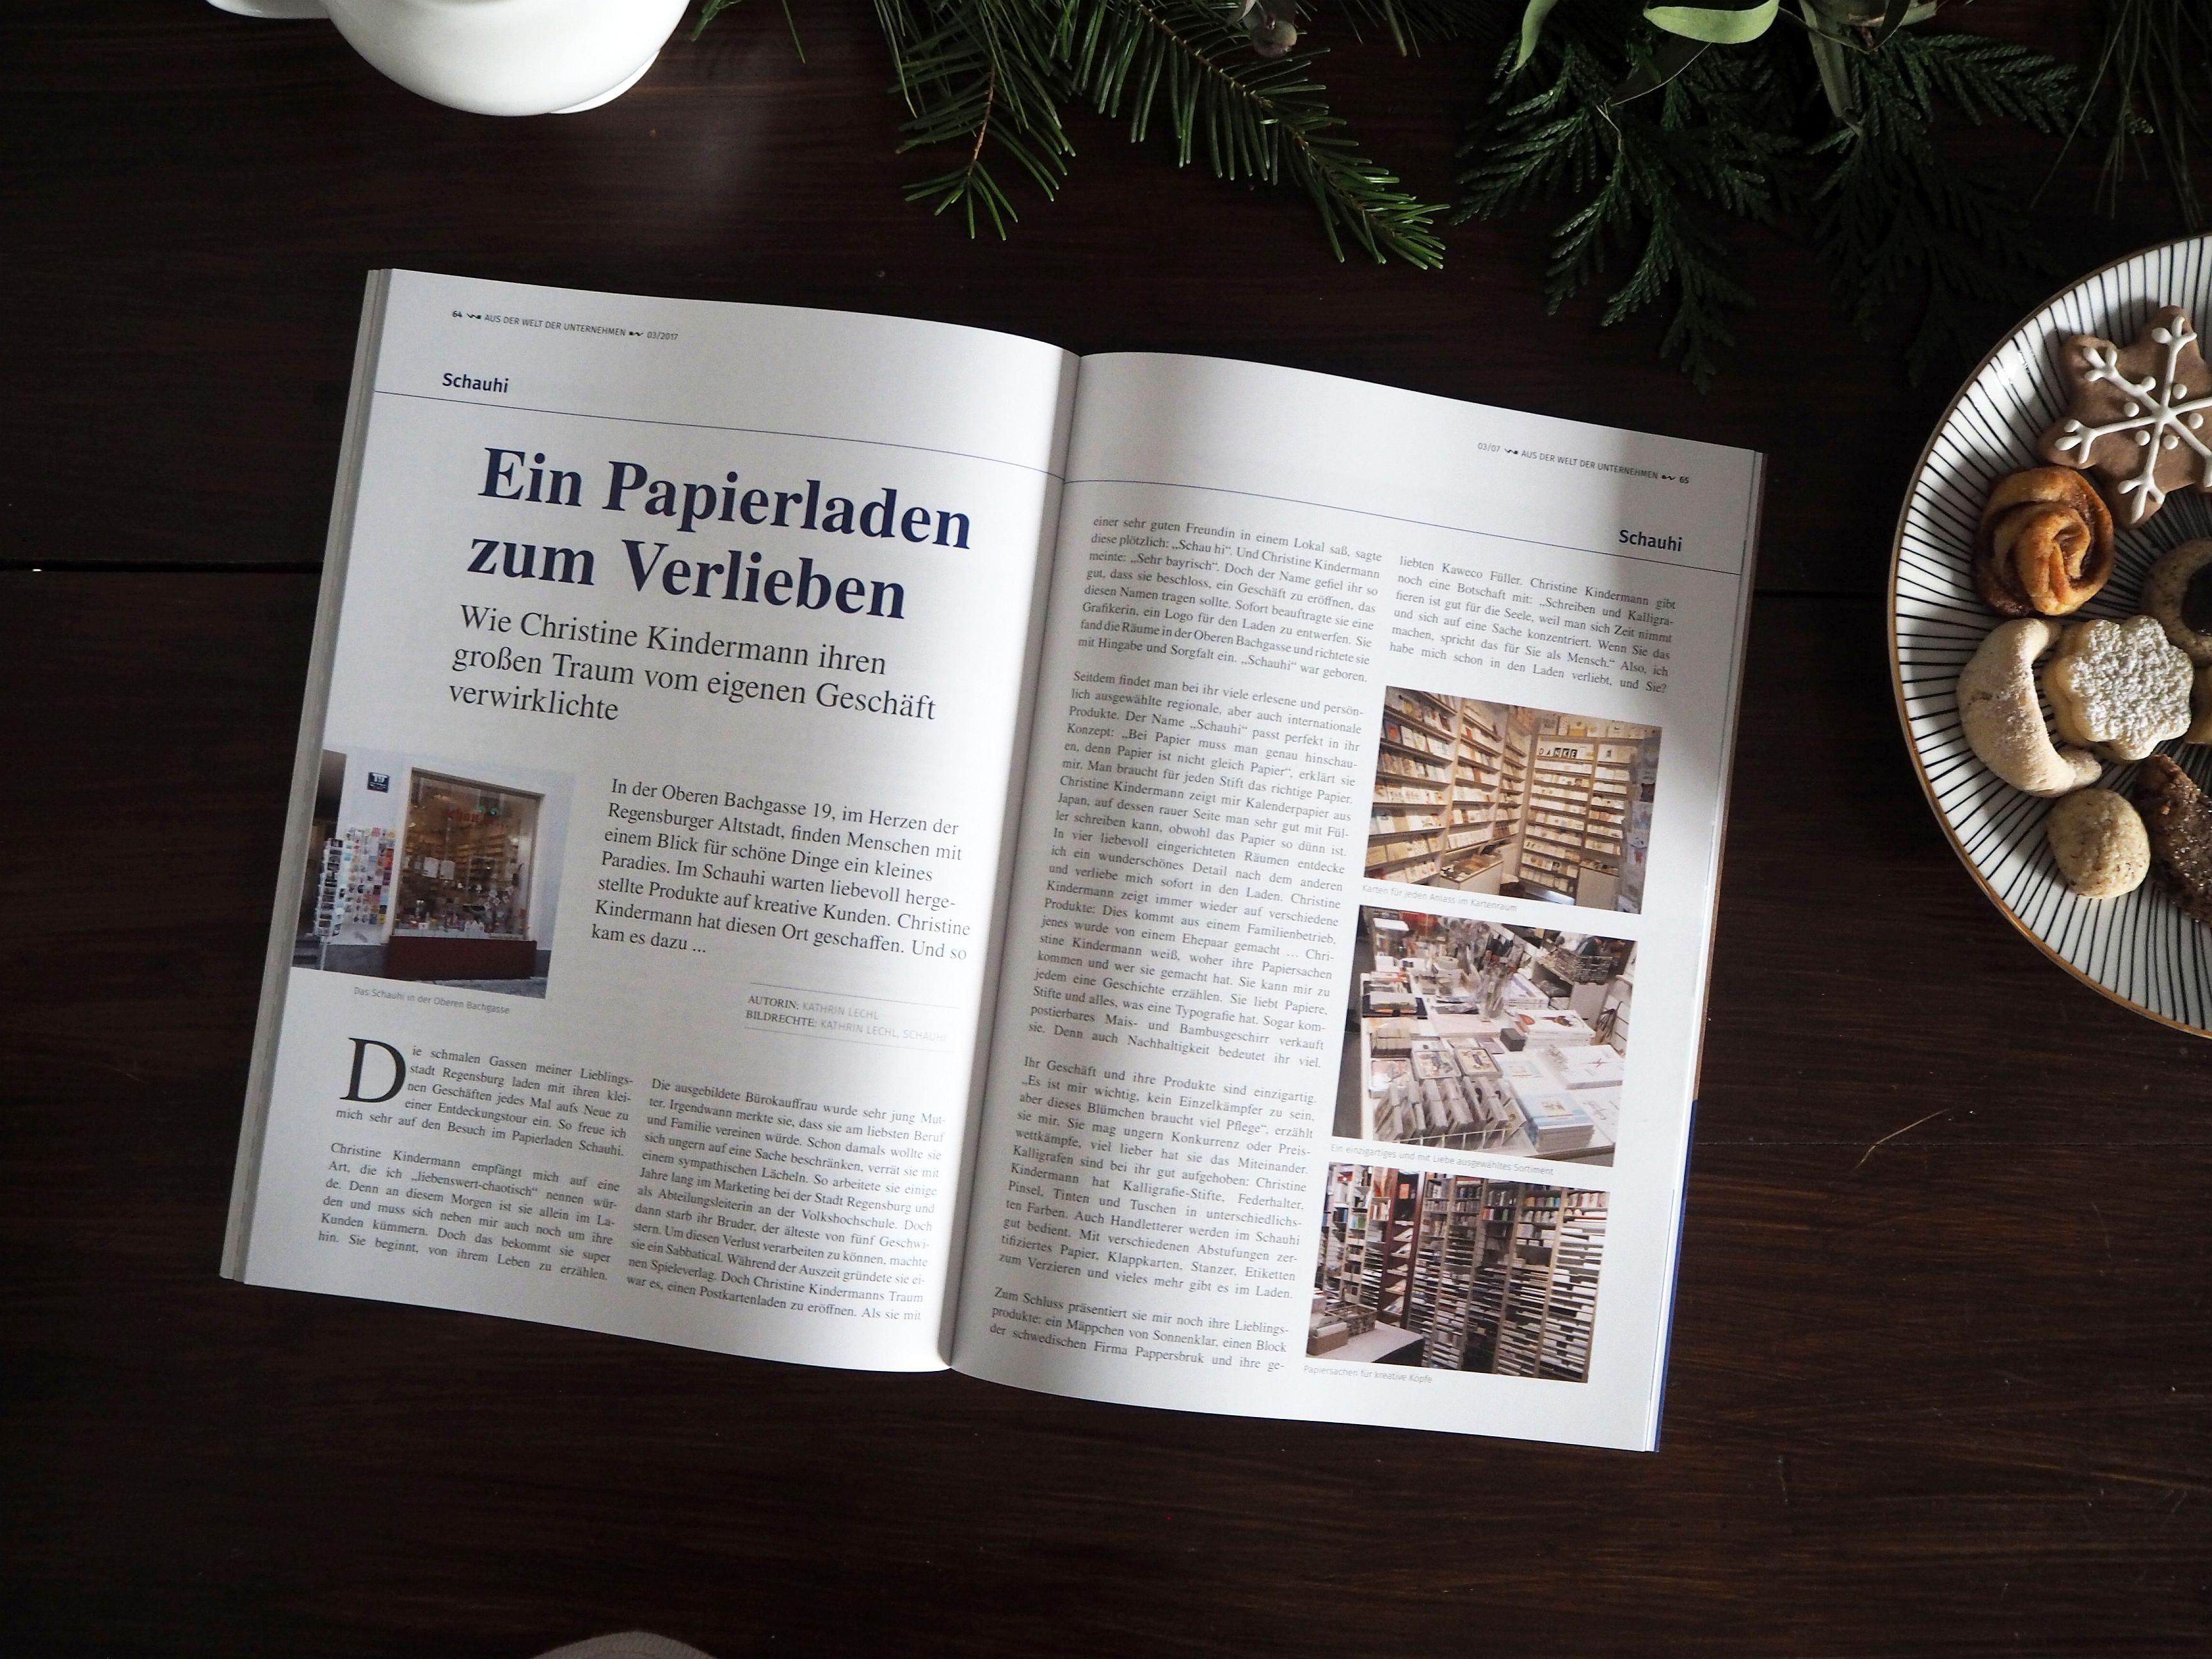 2017-12-skoen-och-kreativ-sonntagslektuere-zeitschrift-kalligrafie-aktuell (17)